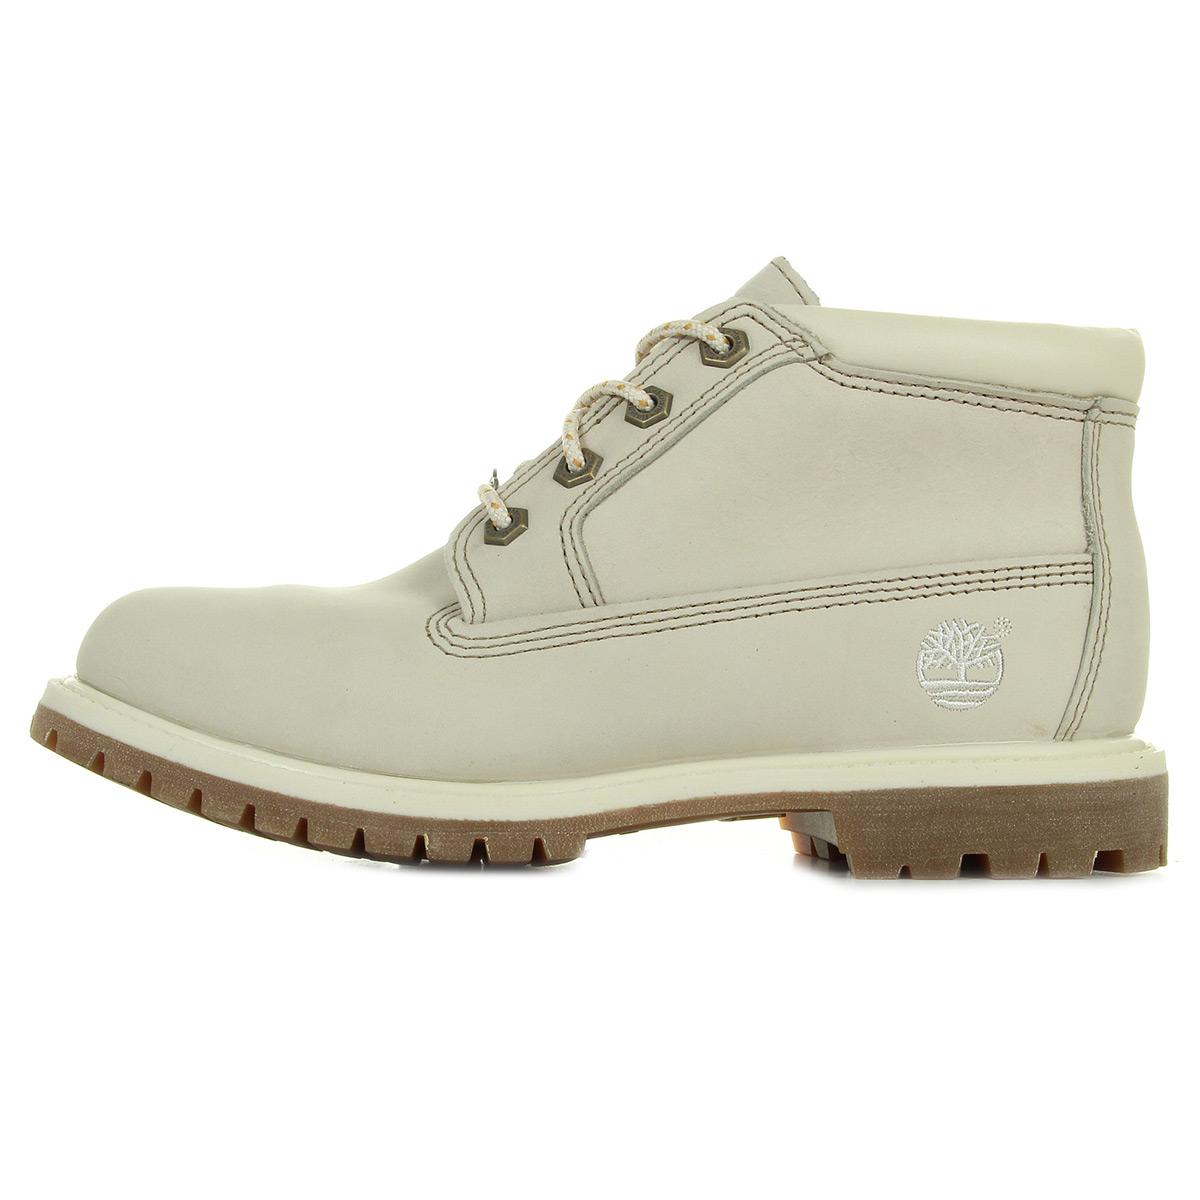 Timberland Chukka Double Waterproof Boost Winter White Nubuck C23671, Boots femme